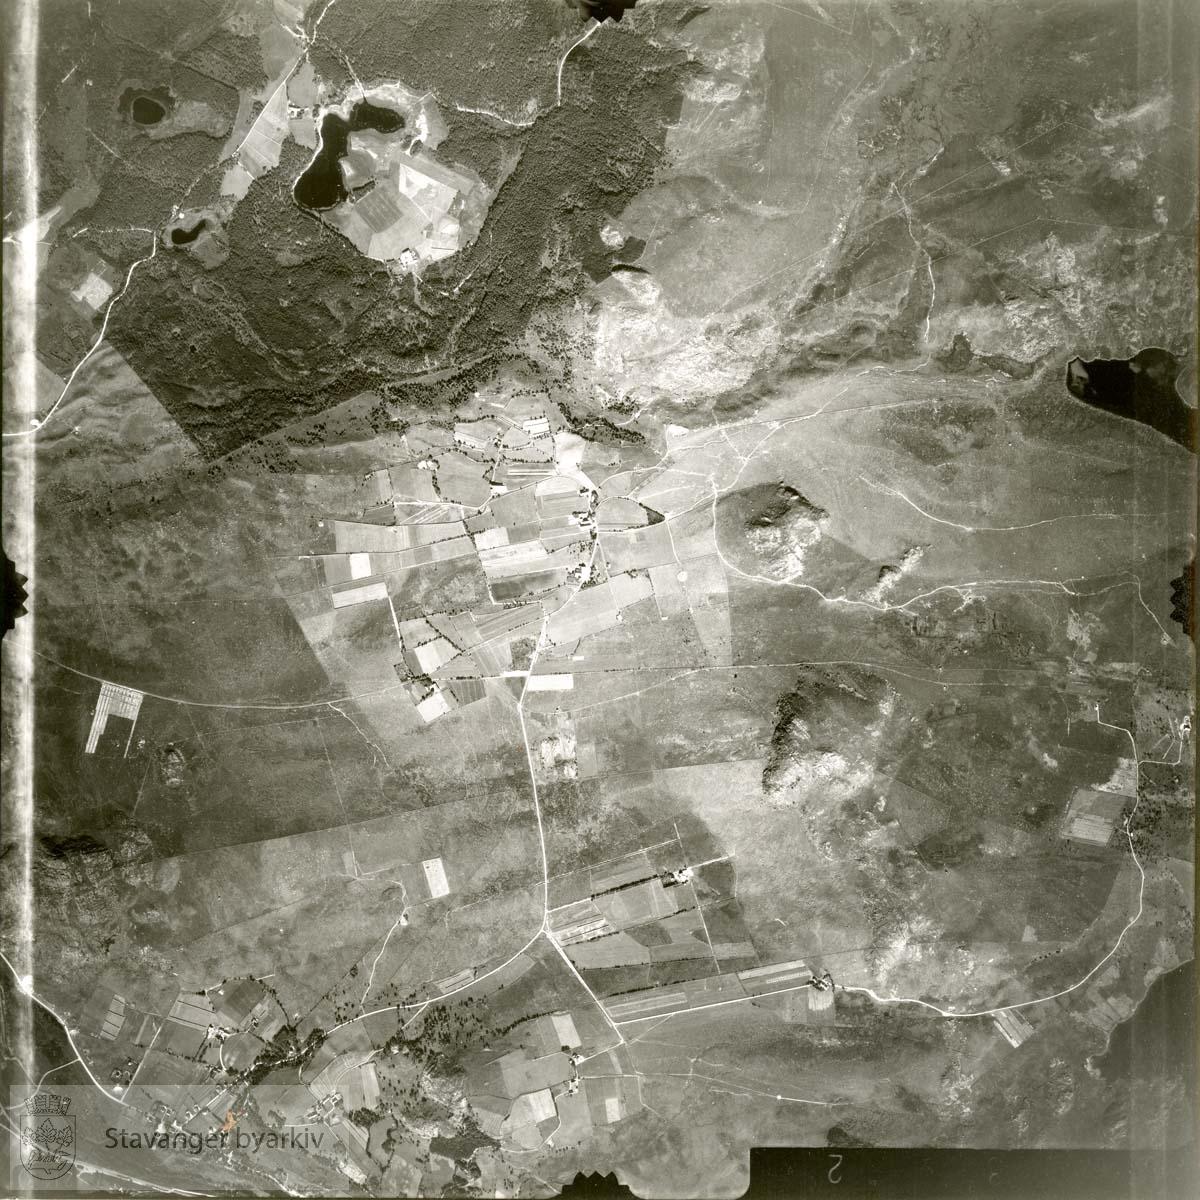 Jfr. kart/fotoplan H7/632..Espeland, Espelandstjørn..Se ByStW_Uca_002 (kan lastes ned under fanen for kart på Stavangerbilder)